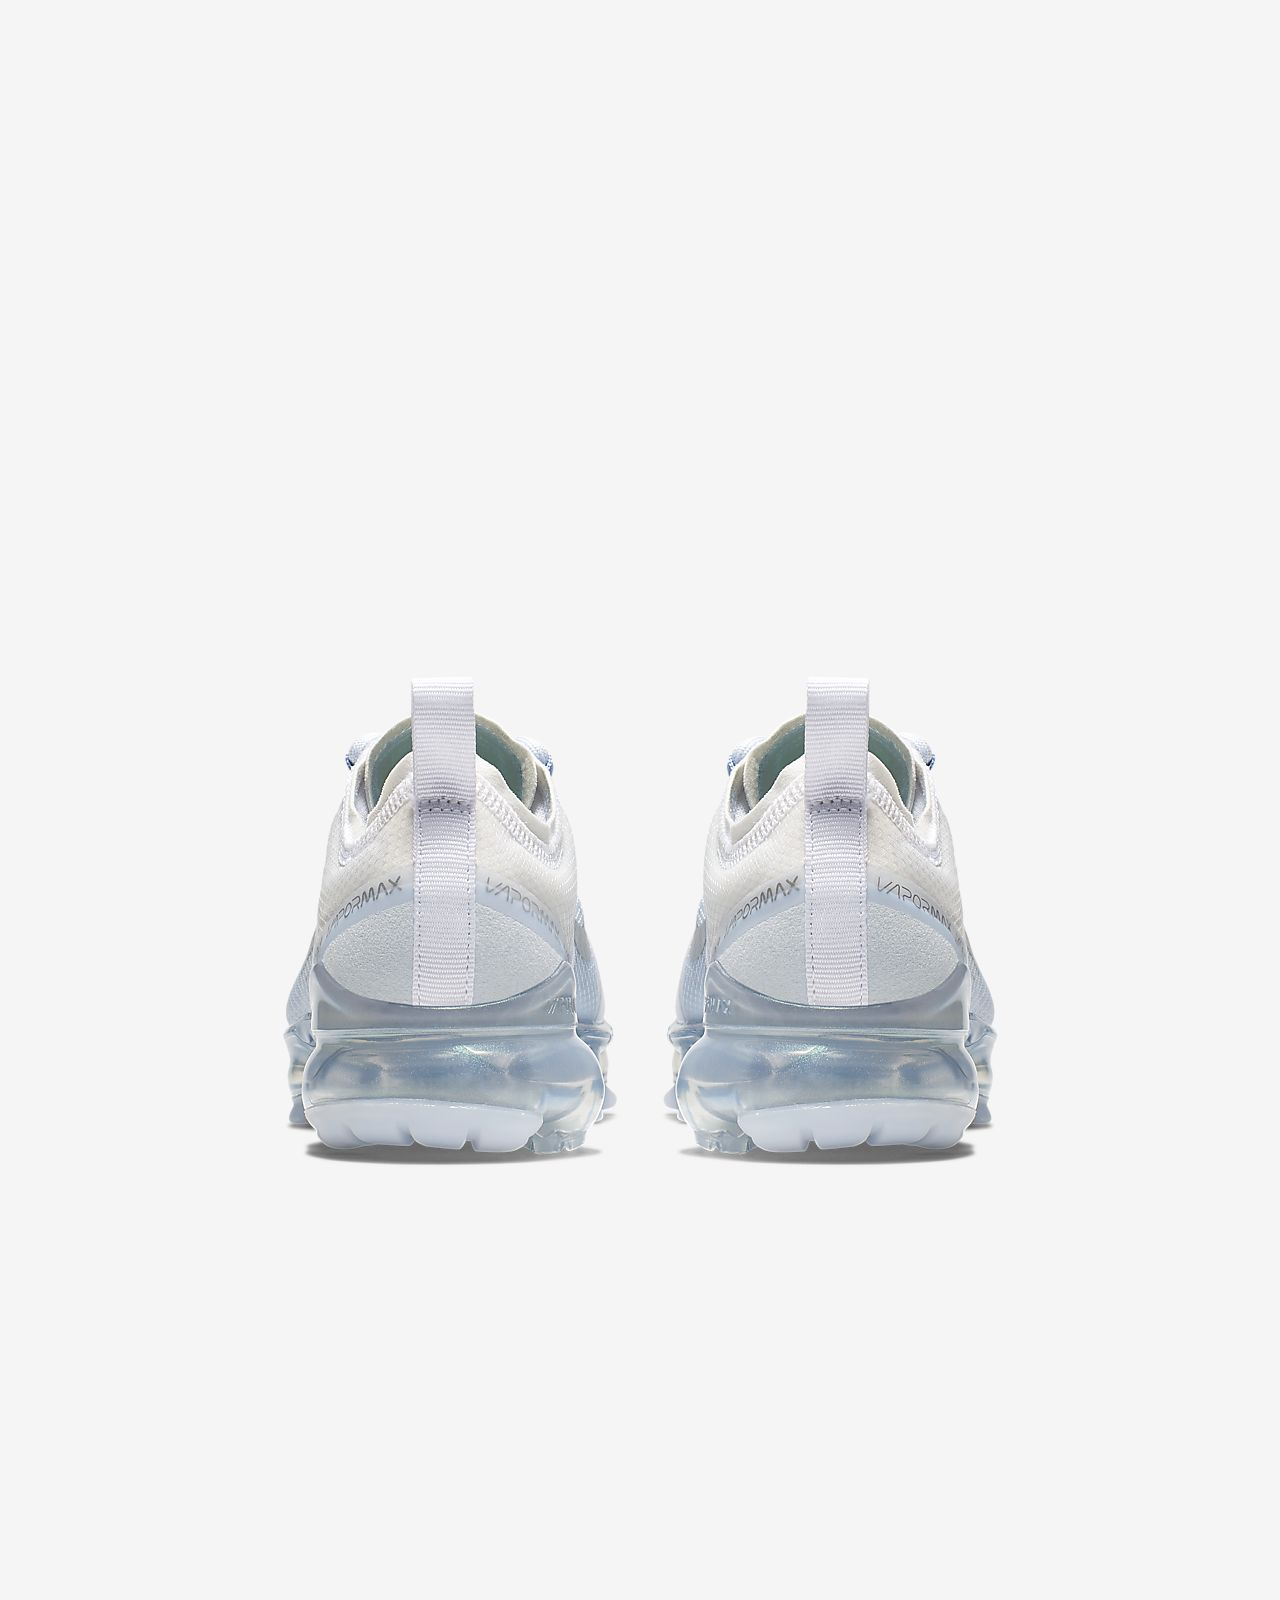 6aea24fc0c132 Nike Air VaporMax 2019 Older Kids  Shoe. Nike.com LU